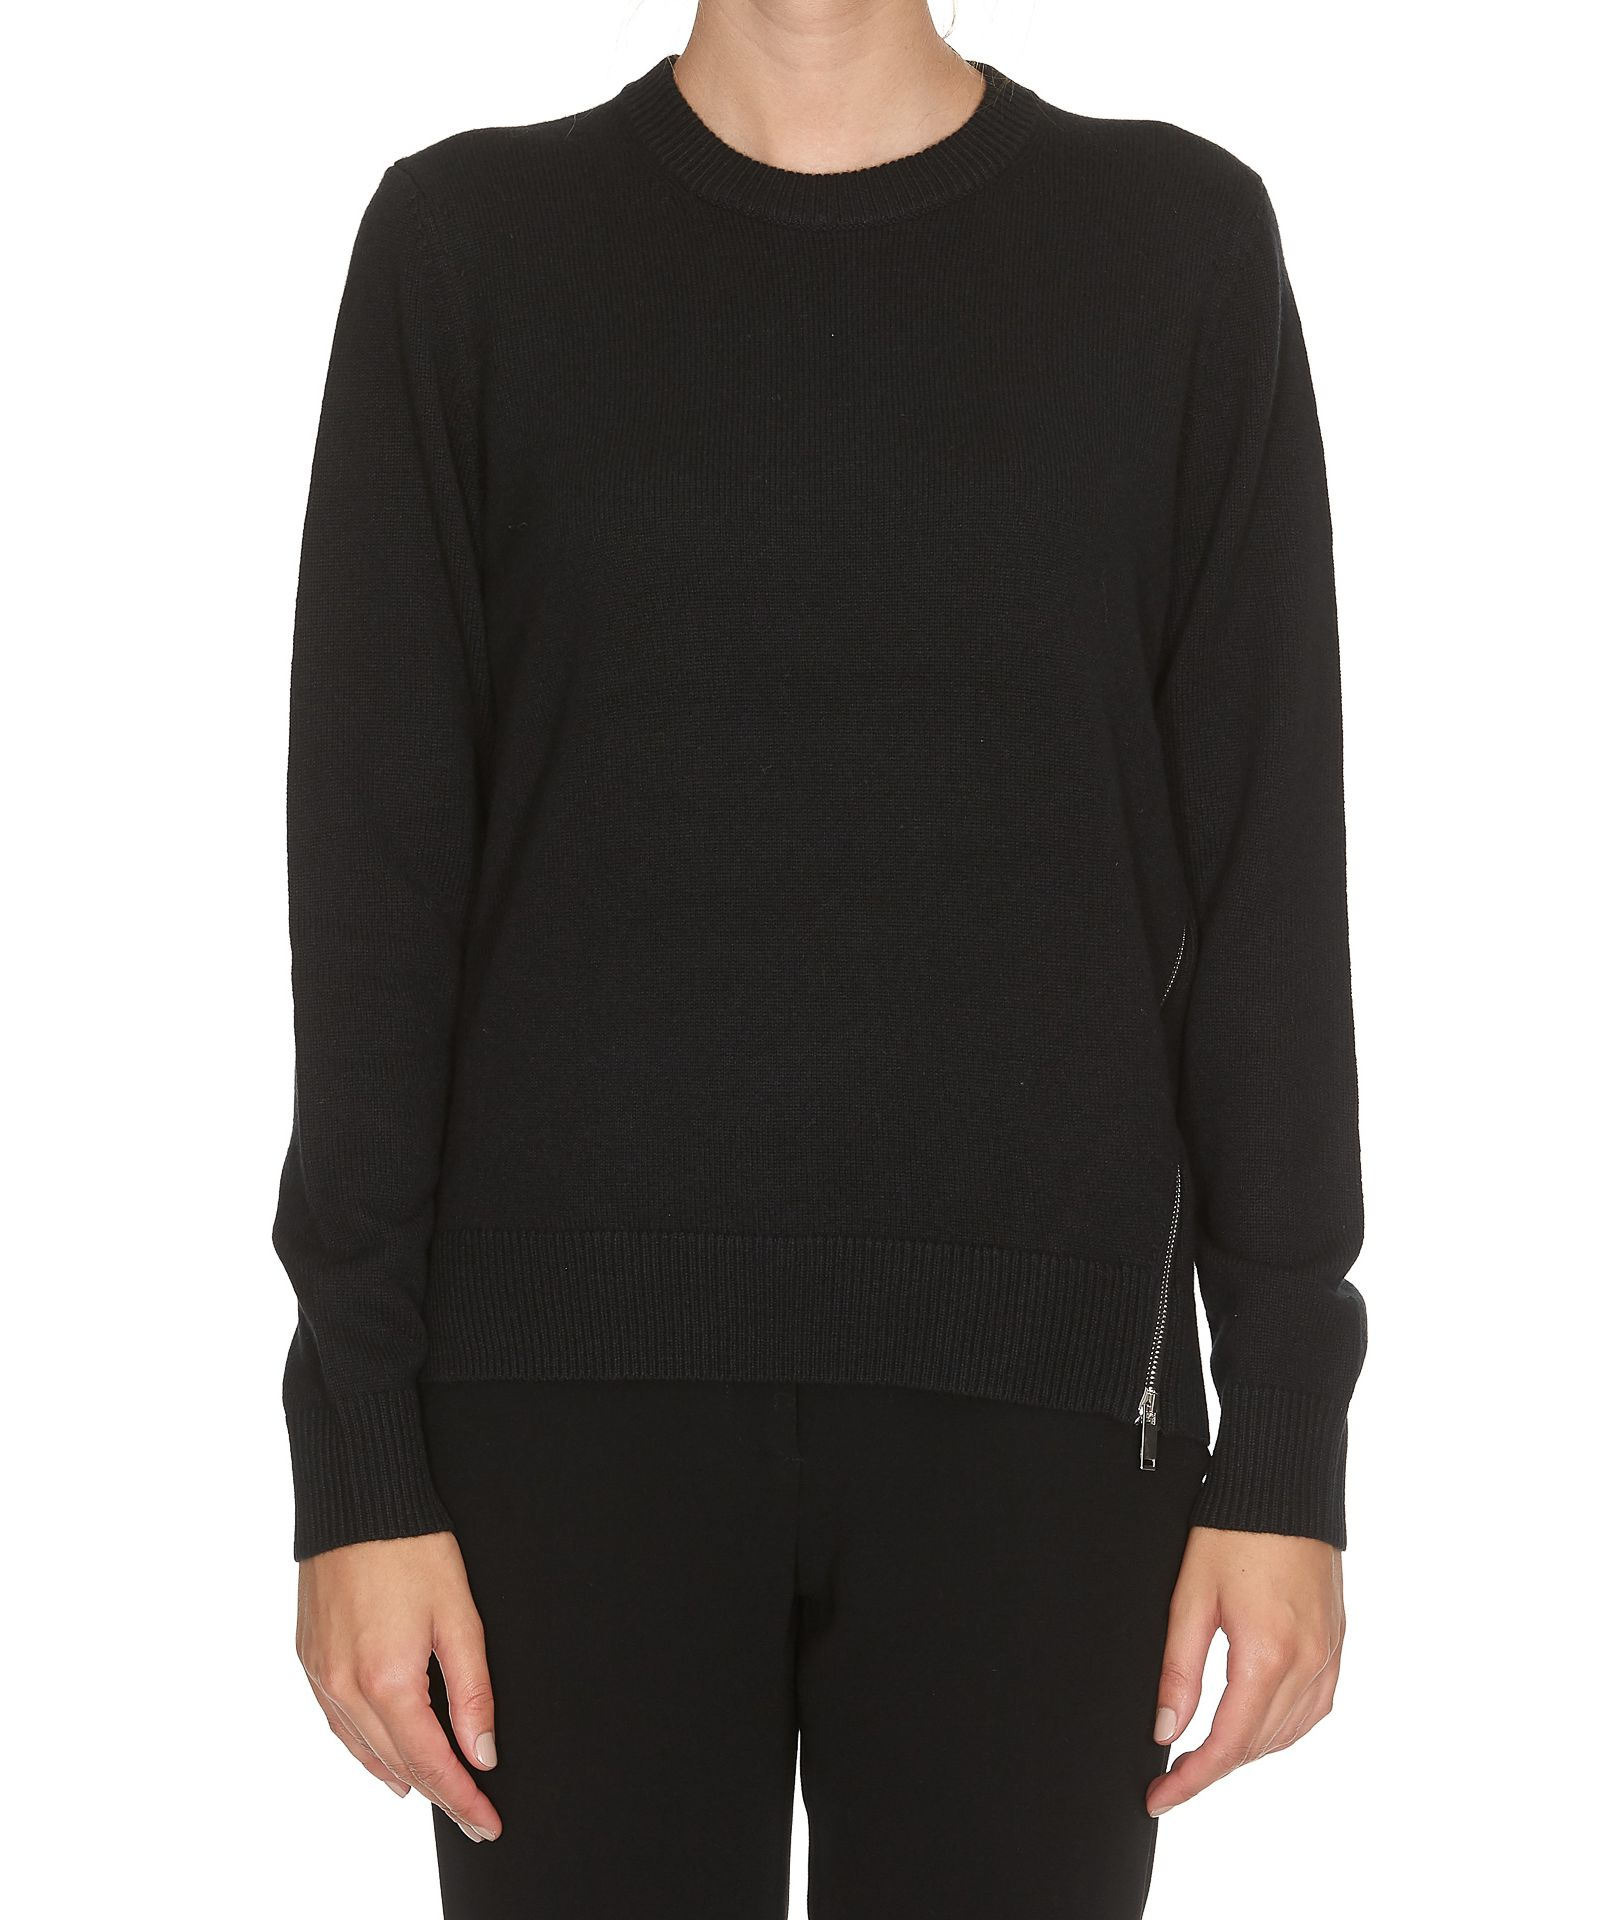 Proenza Schouler Asymmetrical Crew Neck Sweater